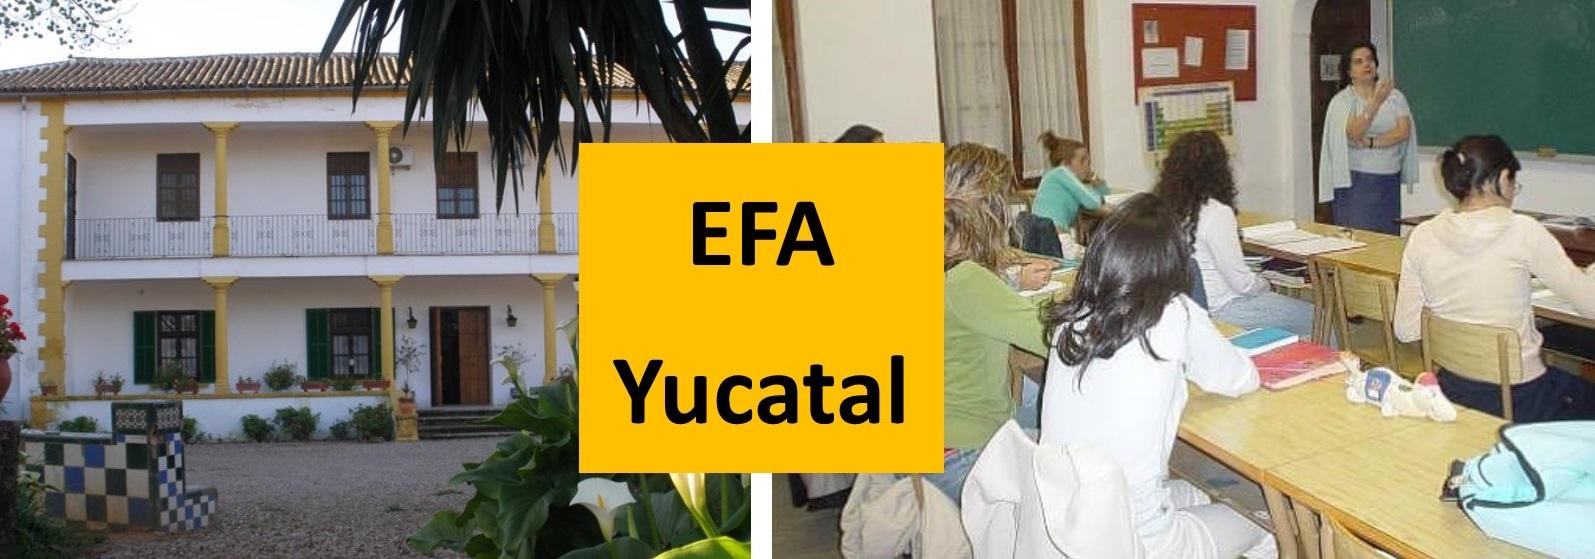 yucatal